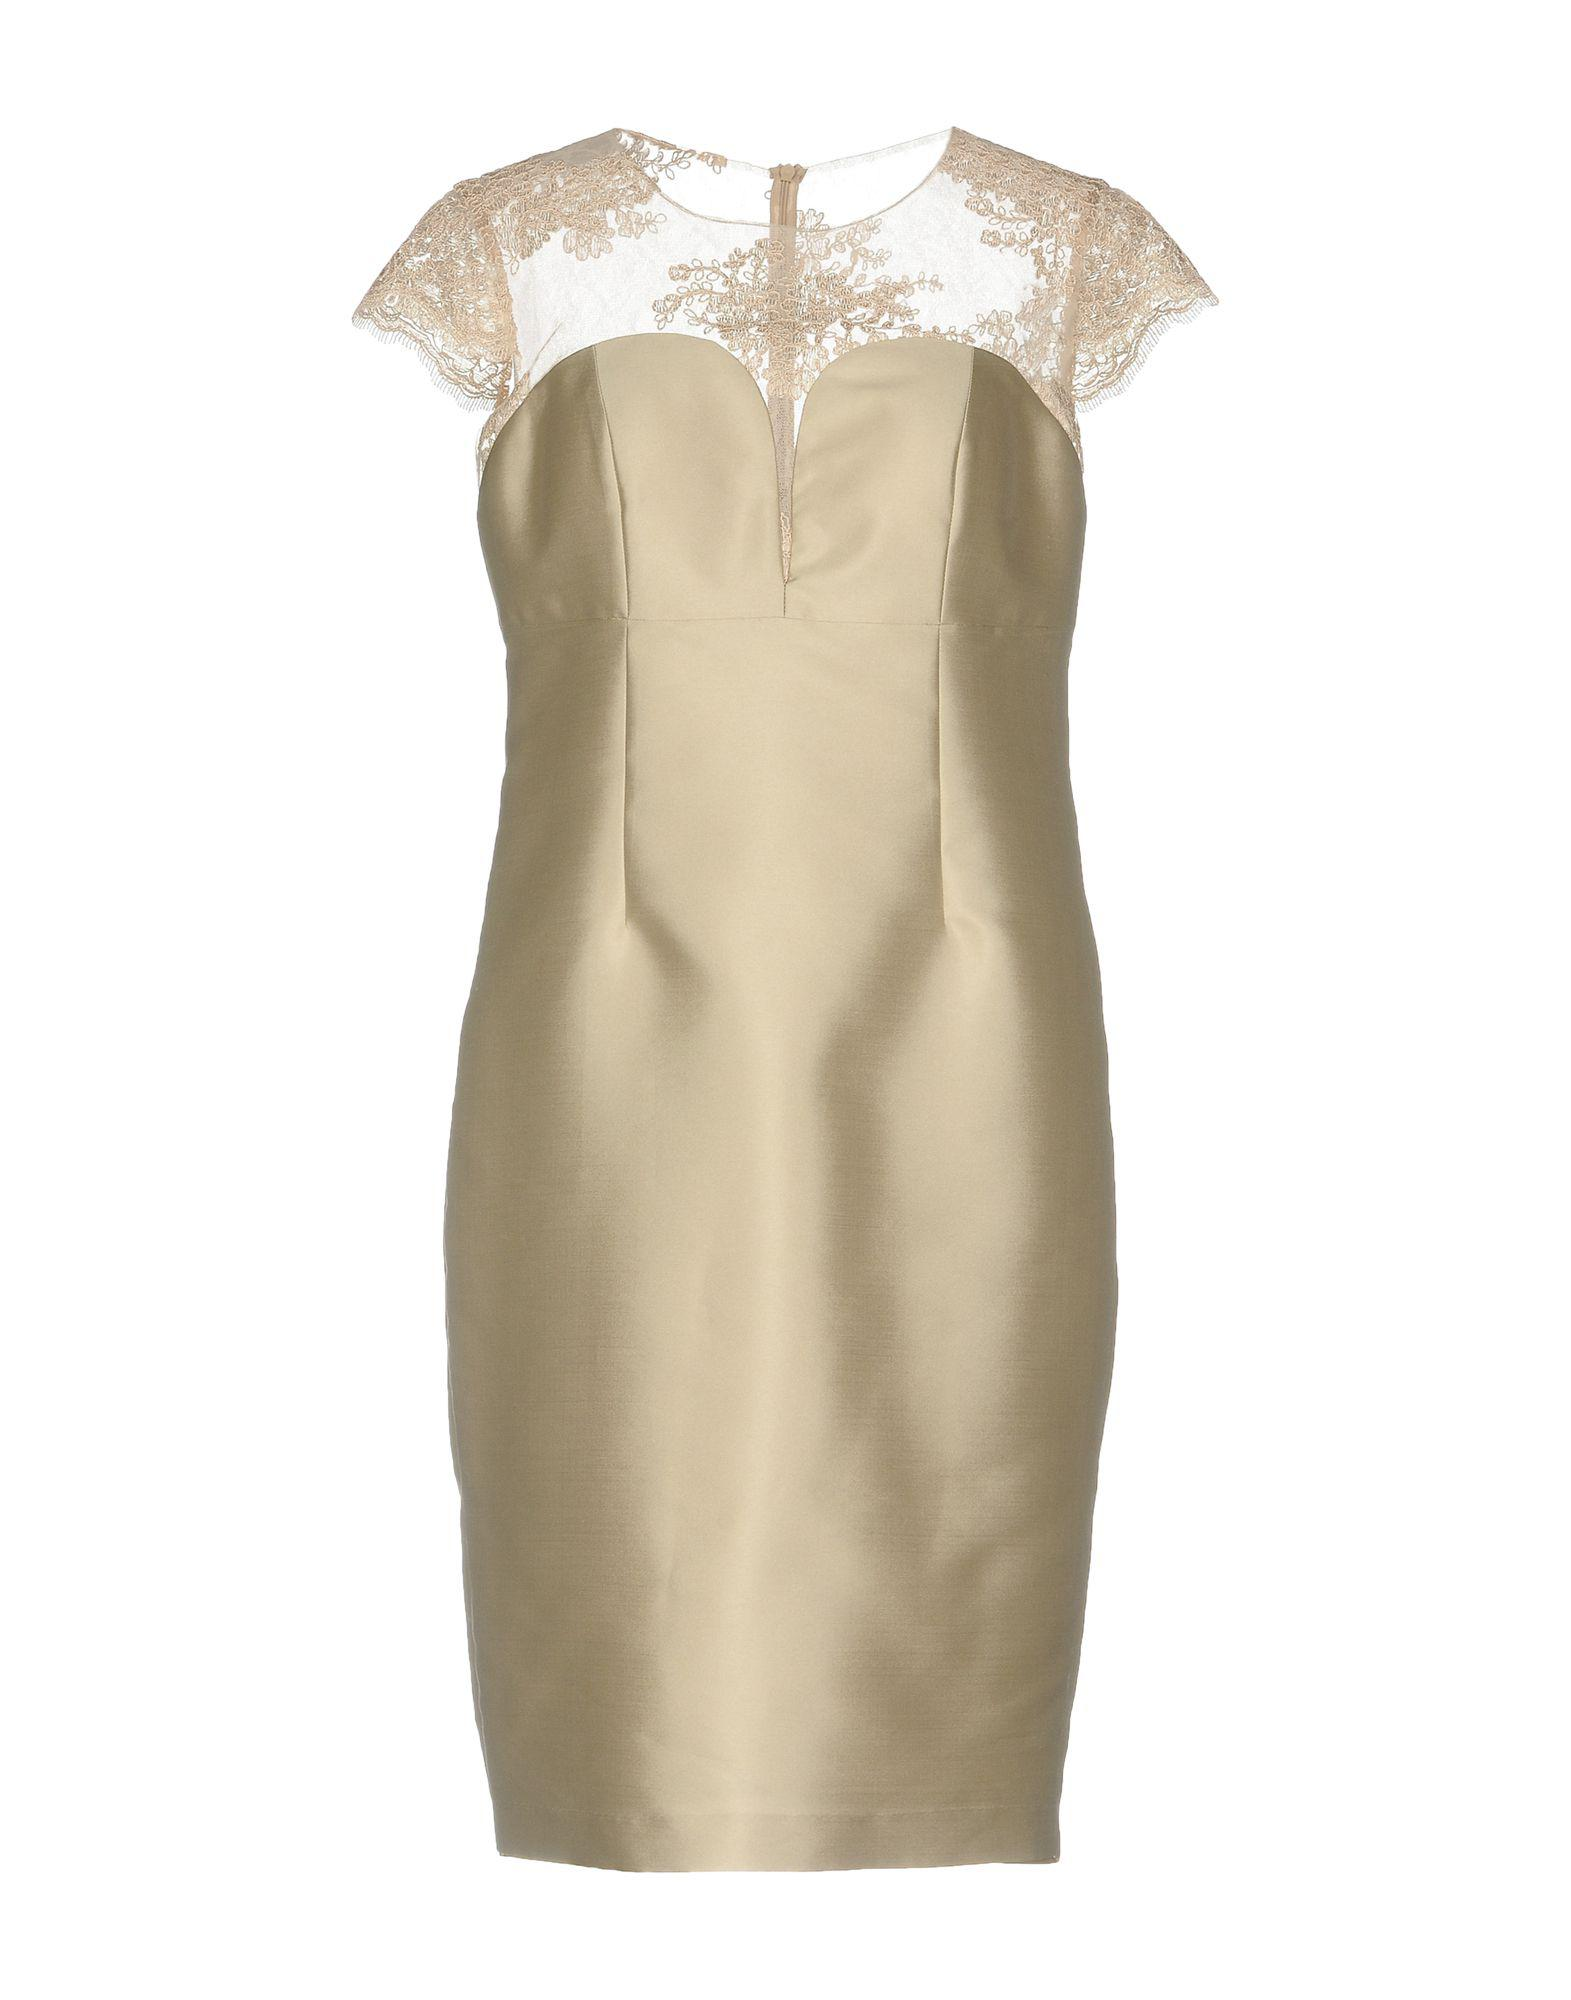 DRESSES - Long dresses Antonio D'errico Nmlqjk9Q